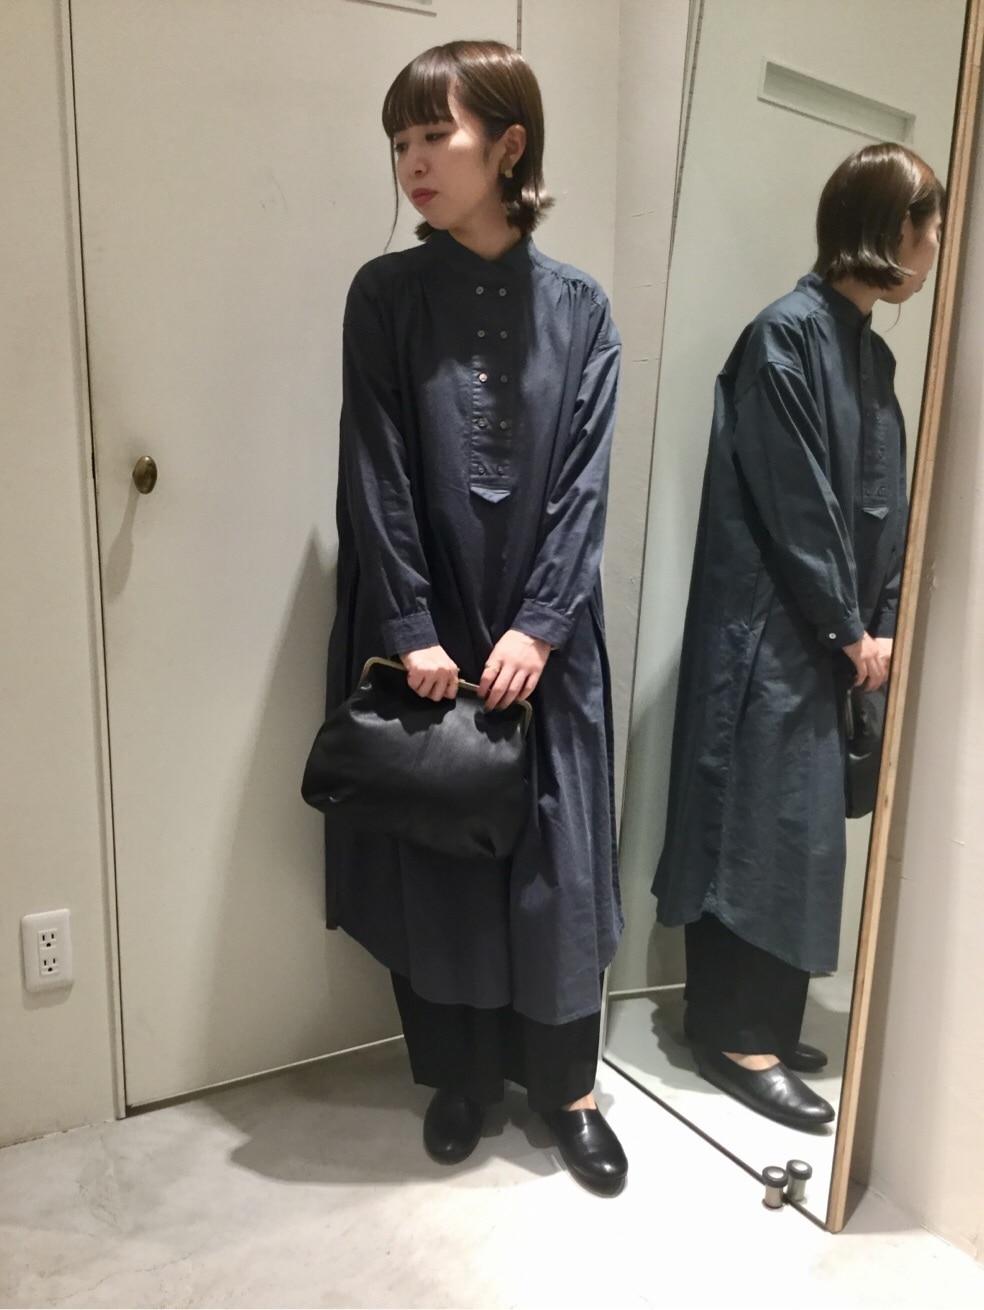 bulle de savon トリエ京王調布 身長:157cm 2019.09.10